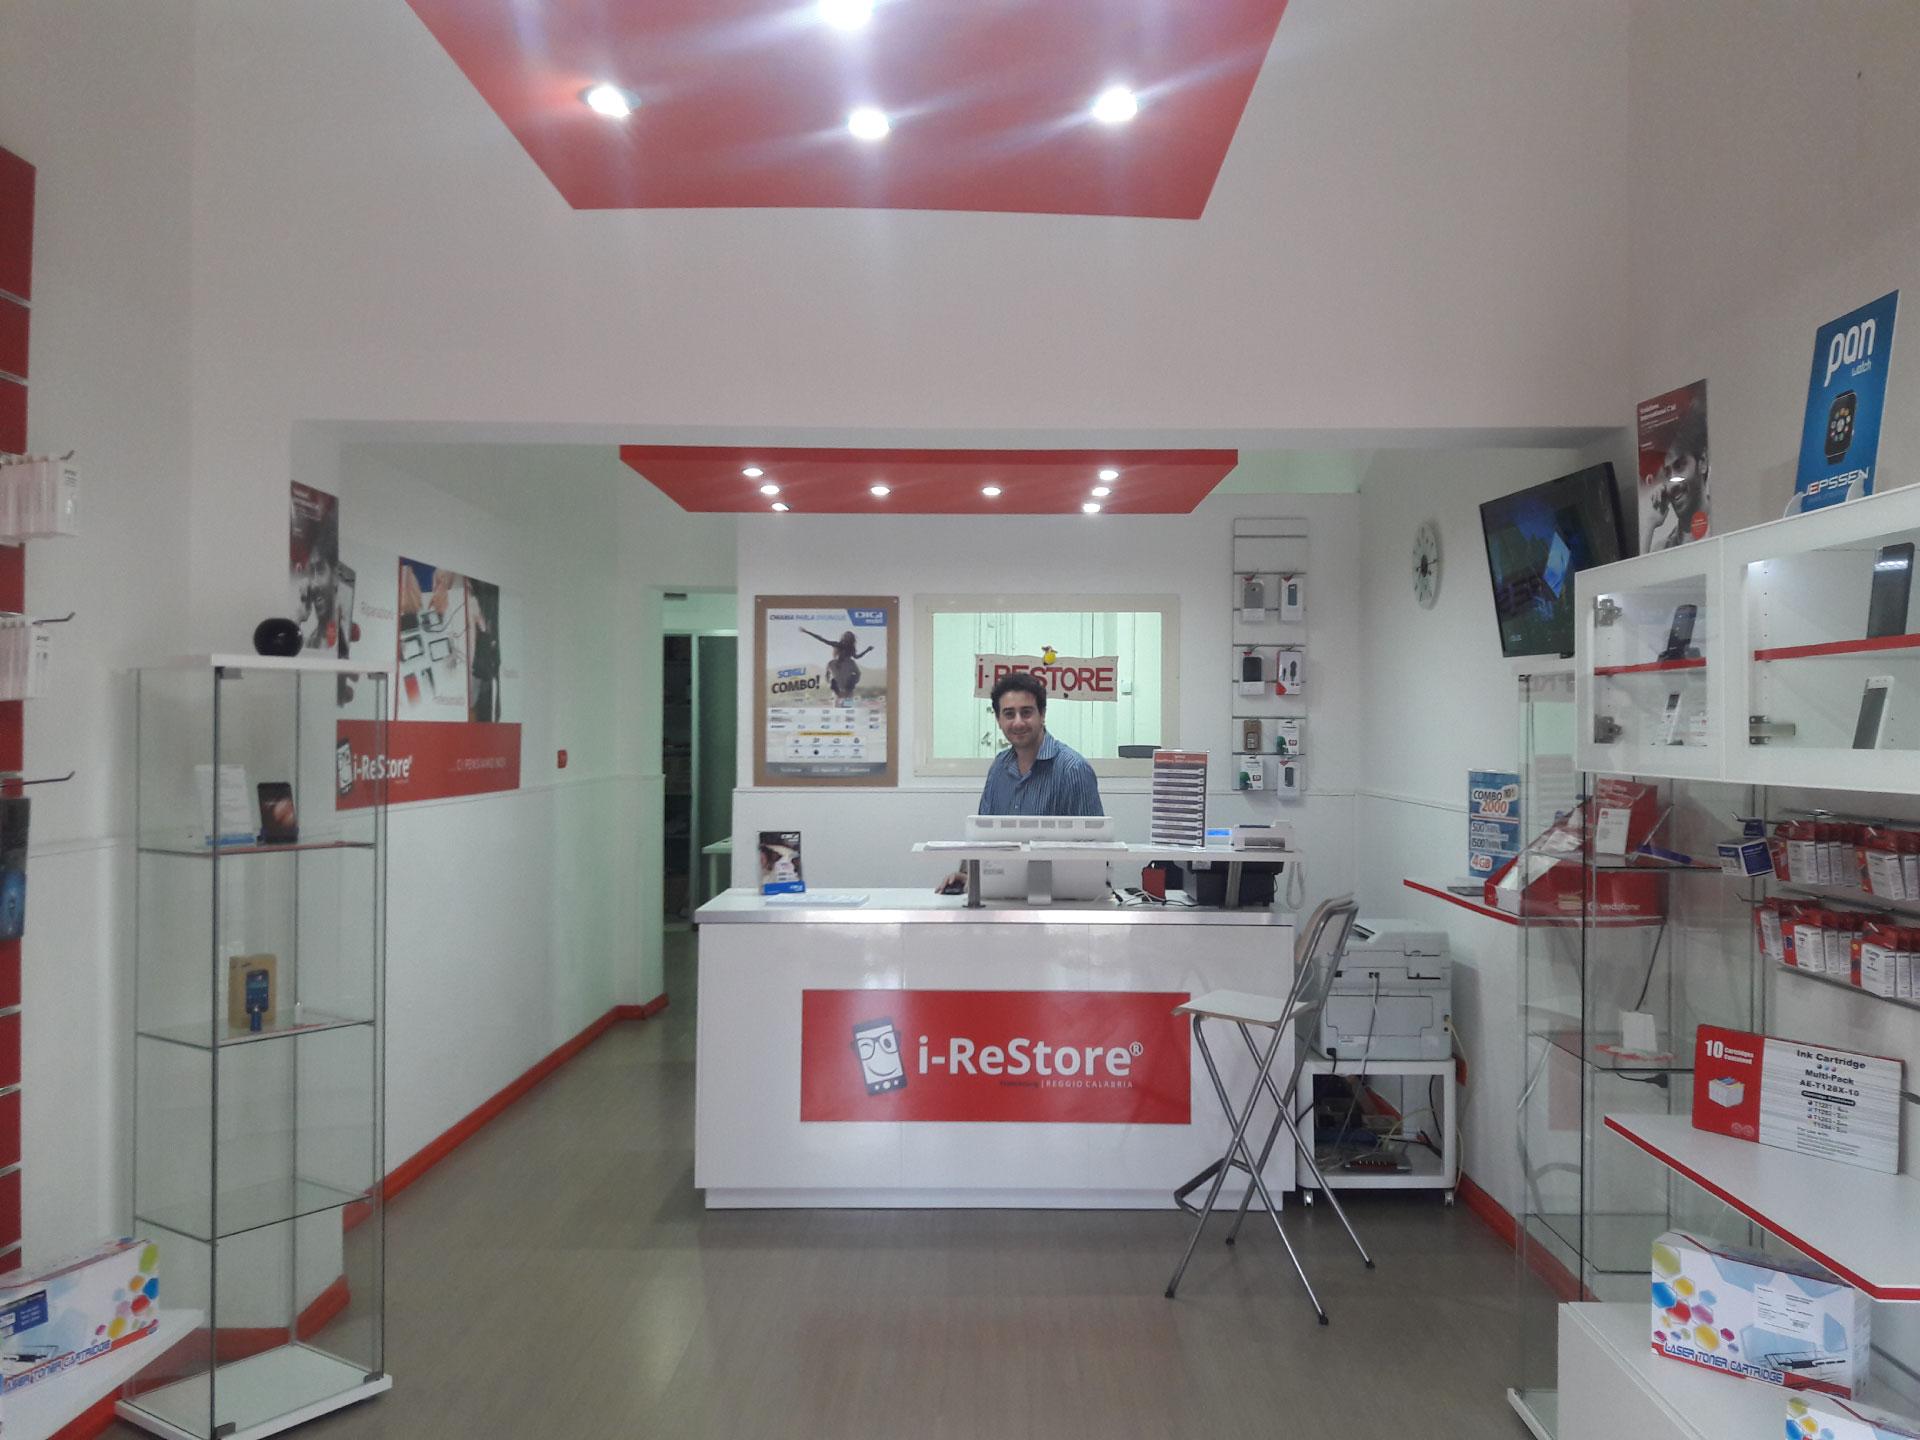 i-restore reggio calabria negozio riparazione smartphone tablet Apple iPhone iPad Samsung Galaxy Huawei HTC Nokia Motorola Lenovo